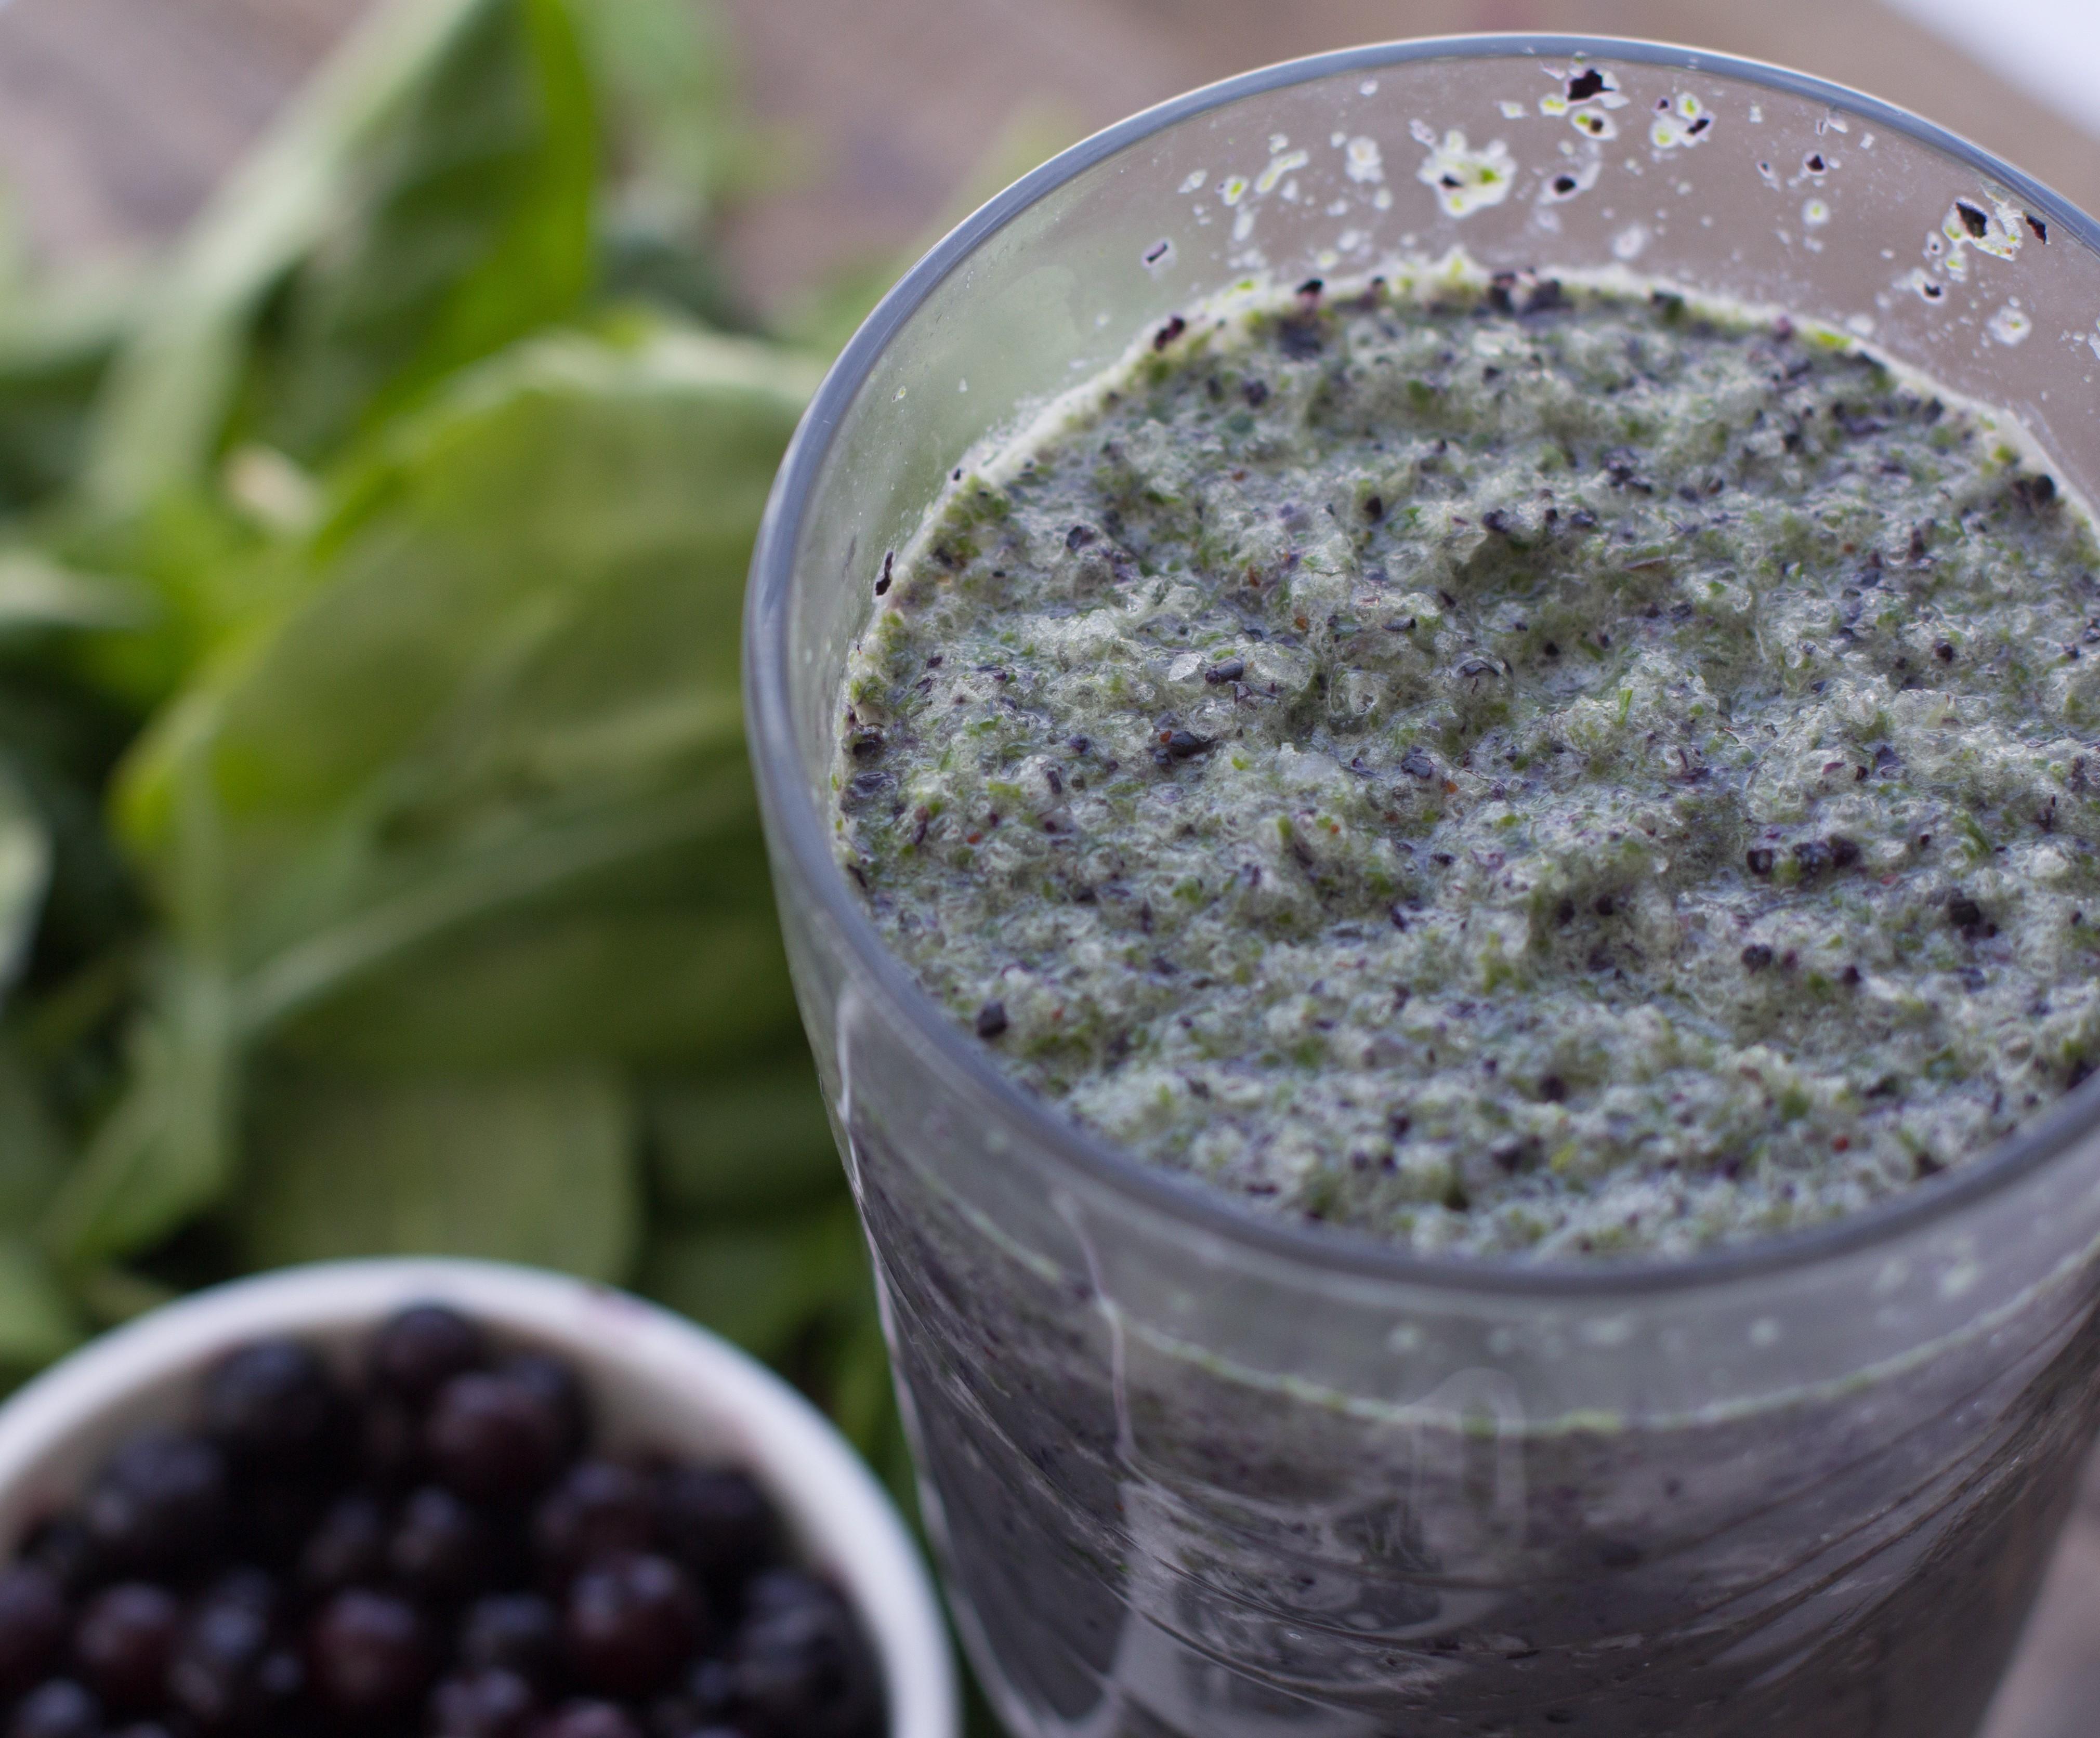 Blueberry Vanilla Protein Shake